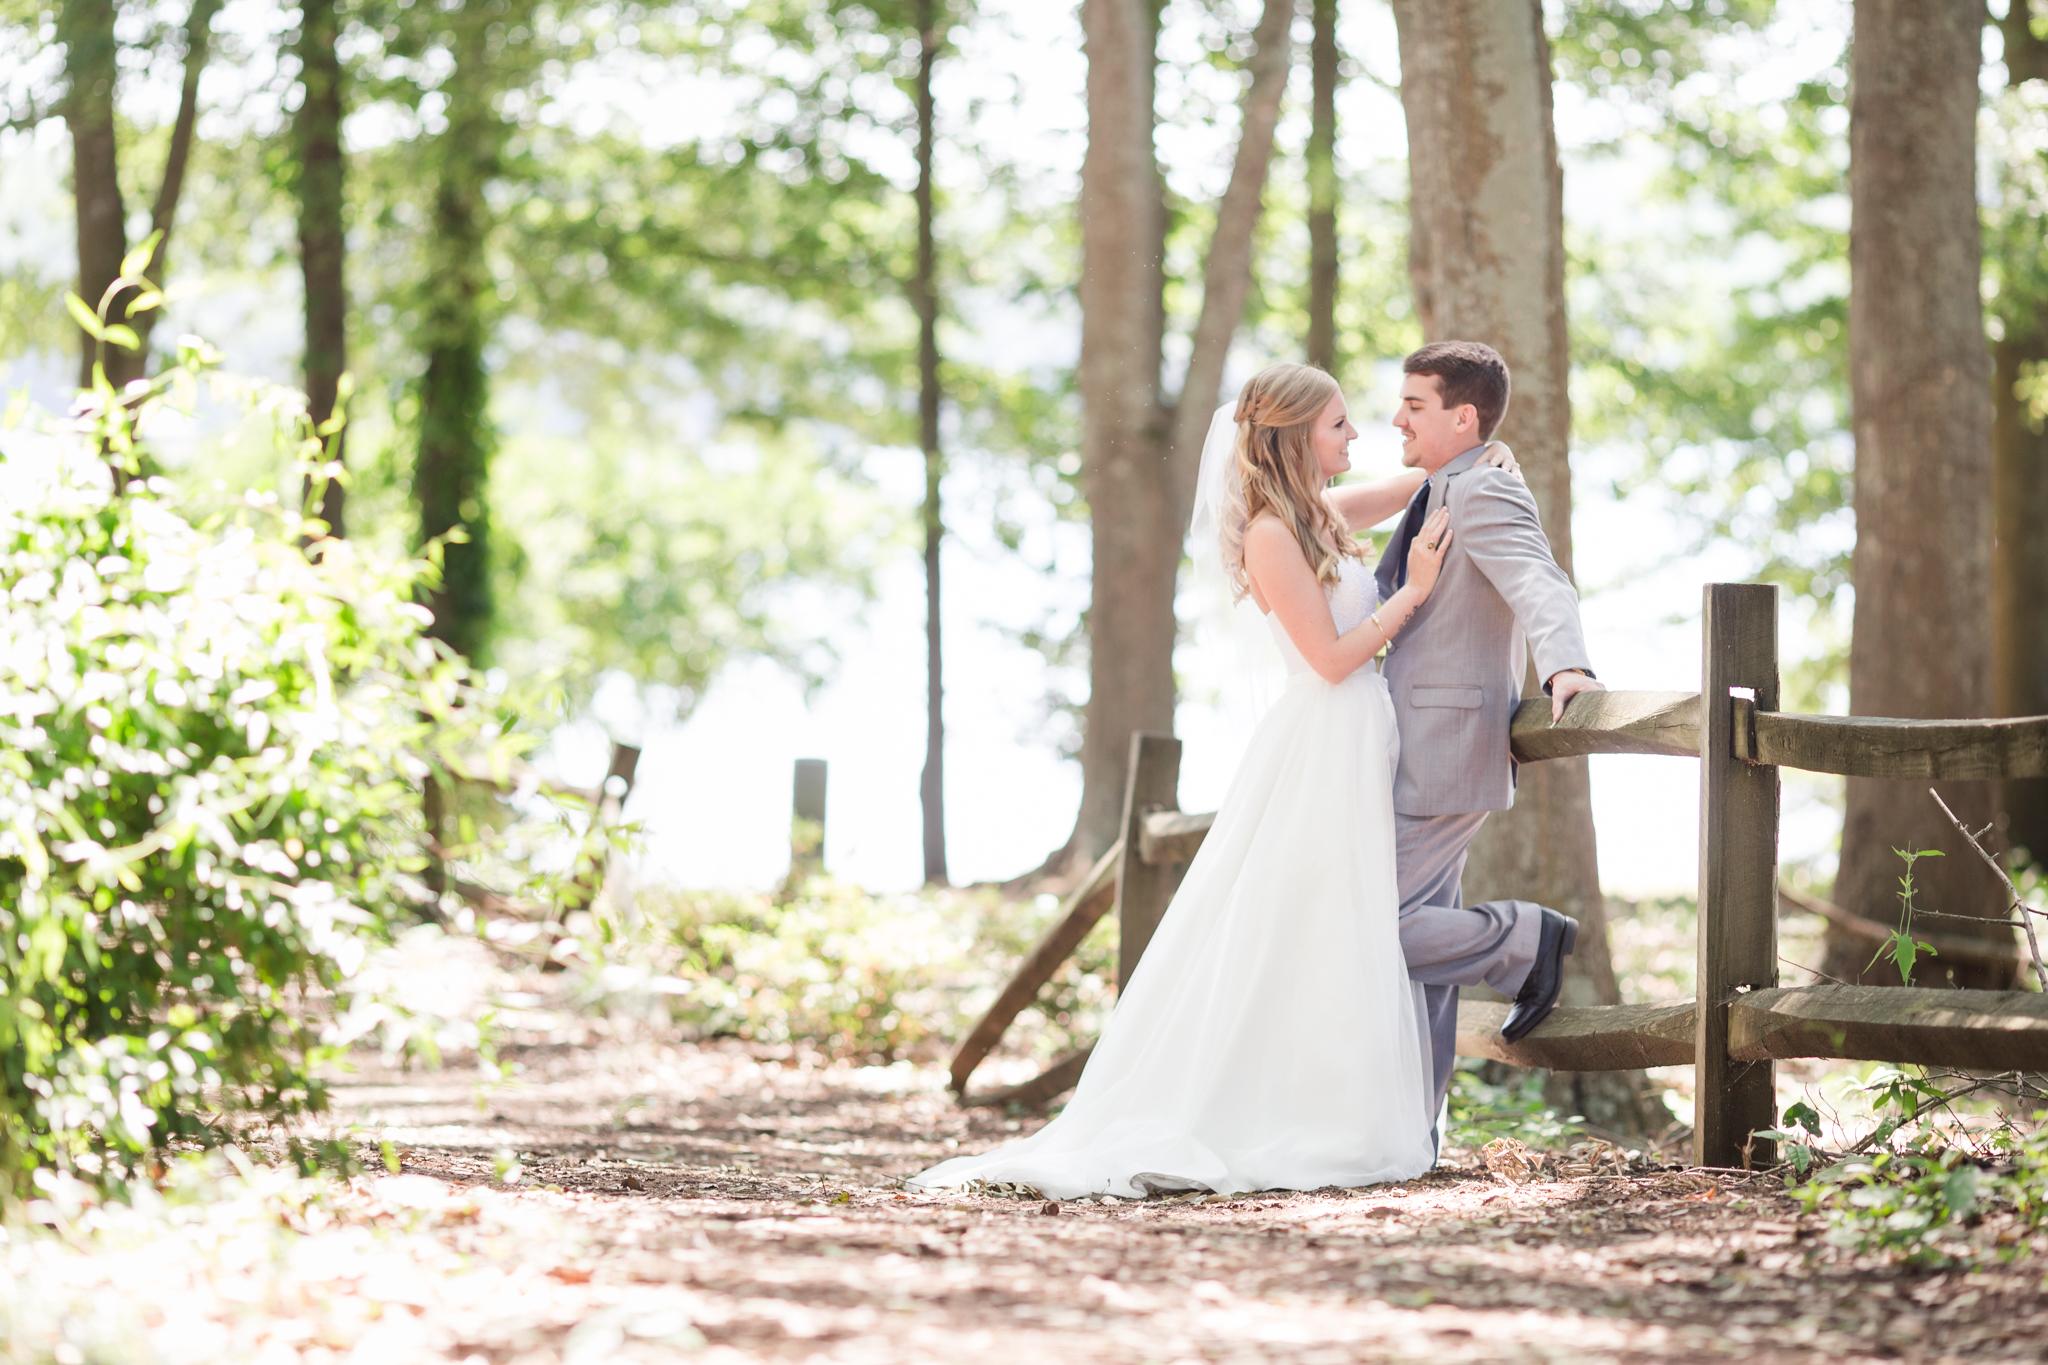 Ashley-Amber-Photo-Outdoor-Wedding-Photography-152811.jpg